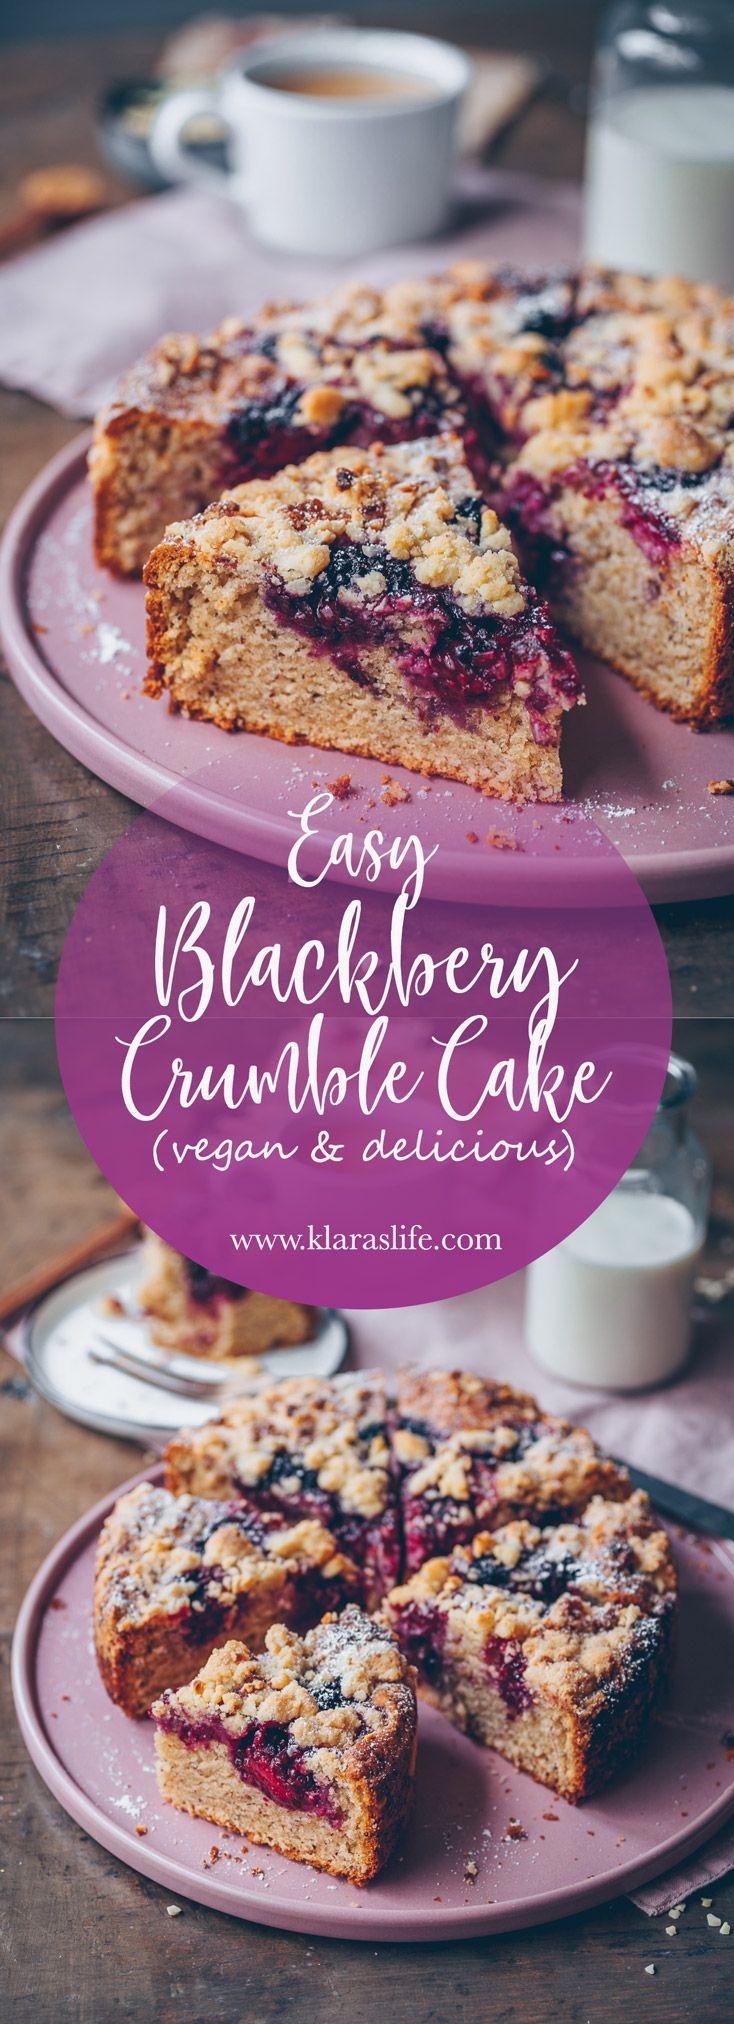 Blackberry Crumble Cake | Recipe | Vegan crumble, Crumble ...